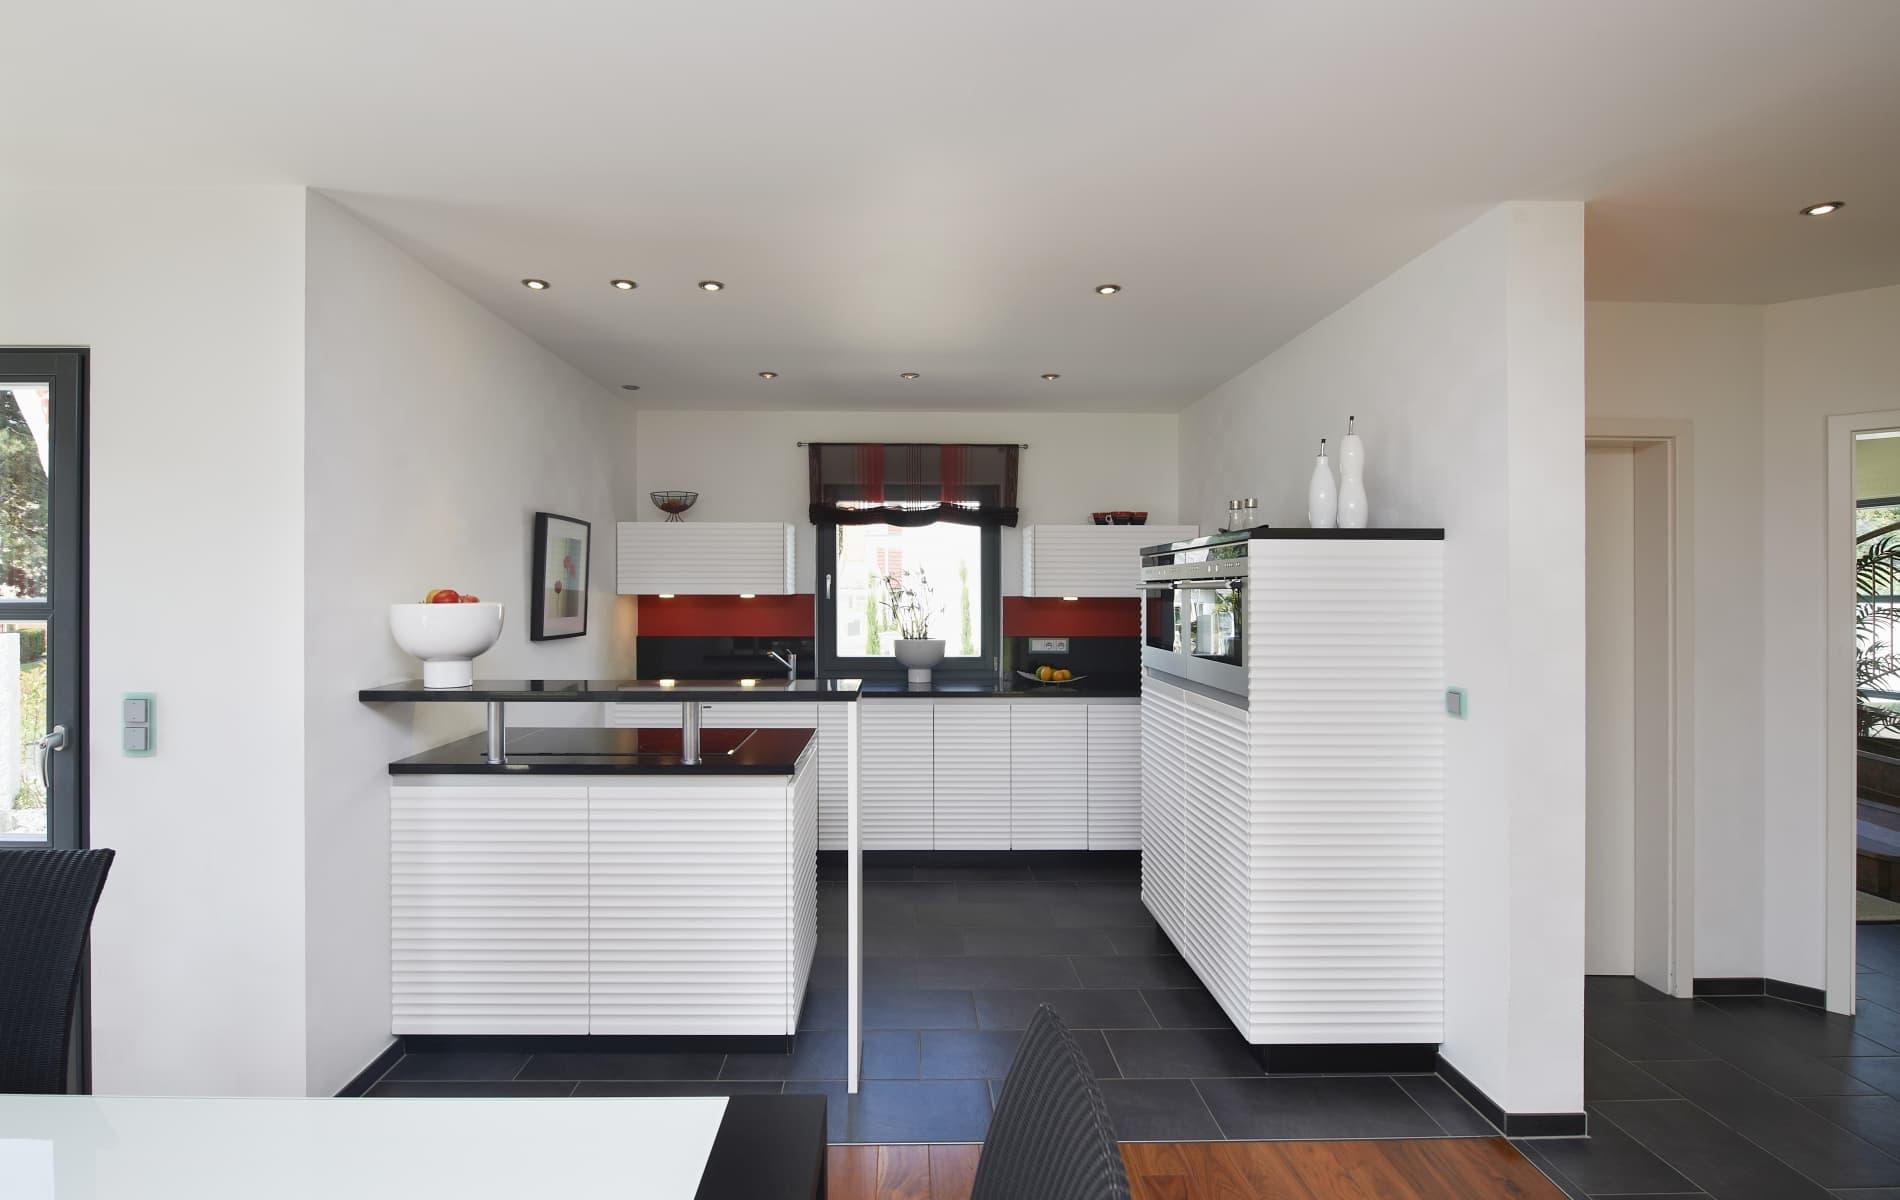 Musterhaus innen küche  RENSCH-HAUS - Musterhaus Valencia - RENSCH-HAUS GMBH - Anbieter ...